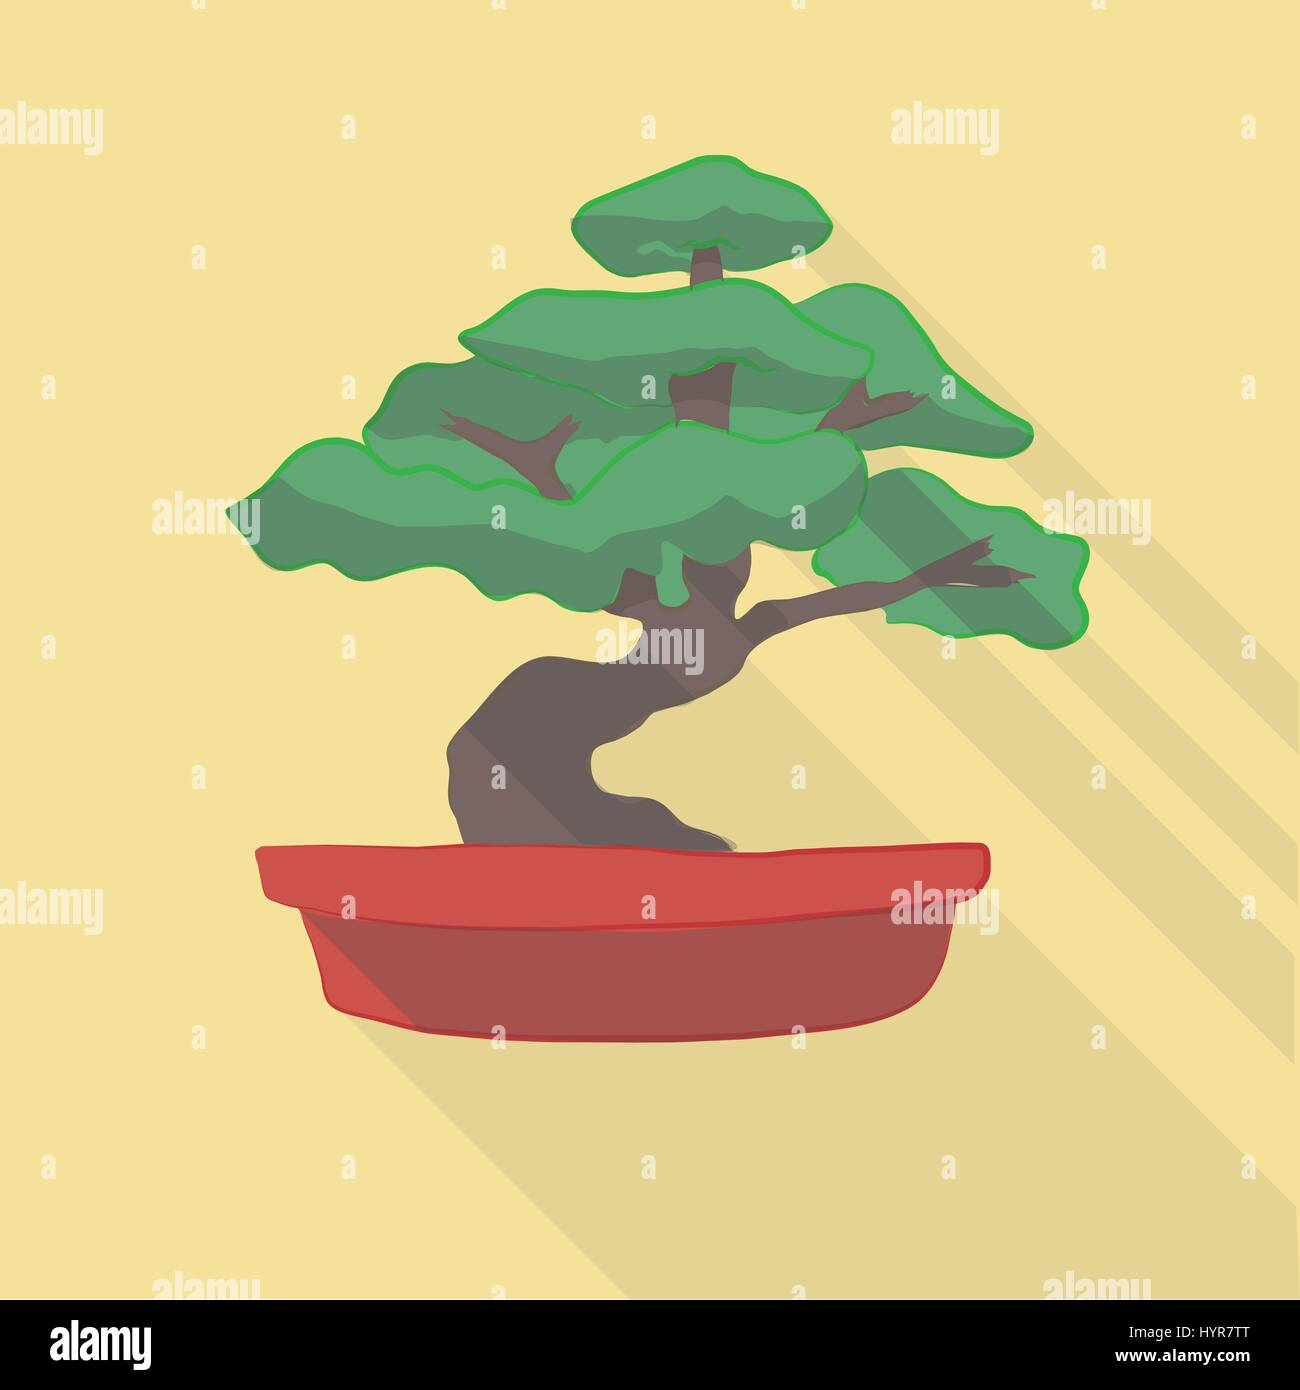 Vector Illustration Long Shadow Flat Icon Of Bonsai Tree Stock Vector Image Art Alamy